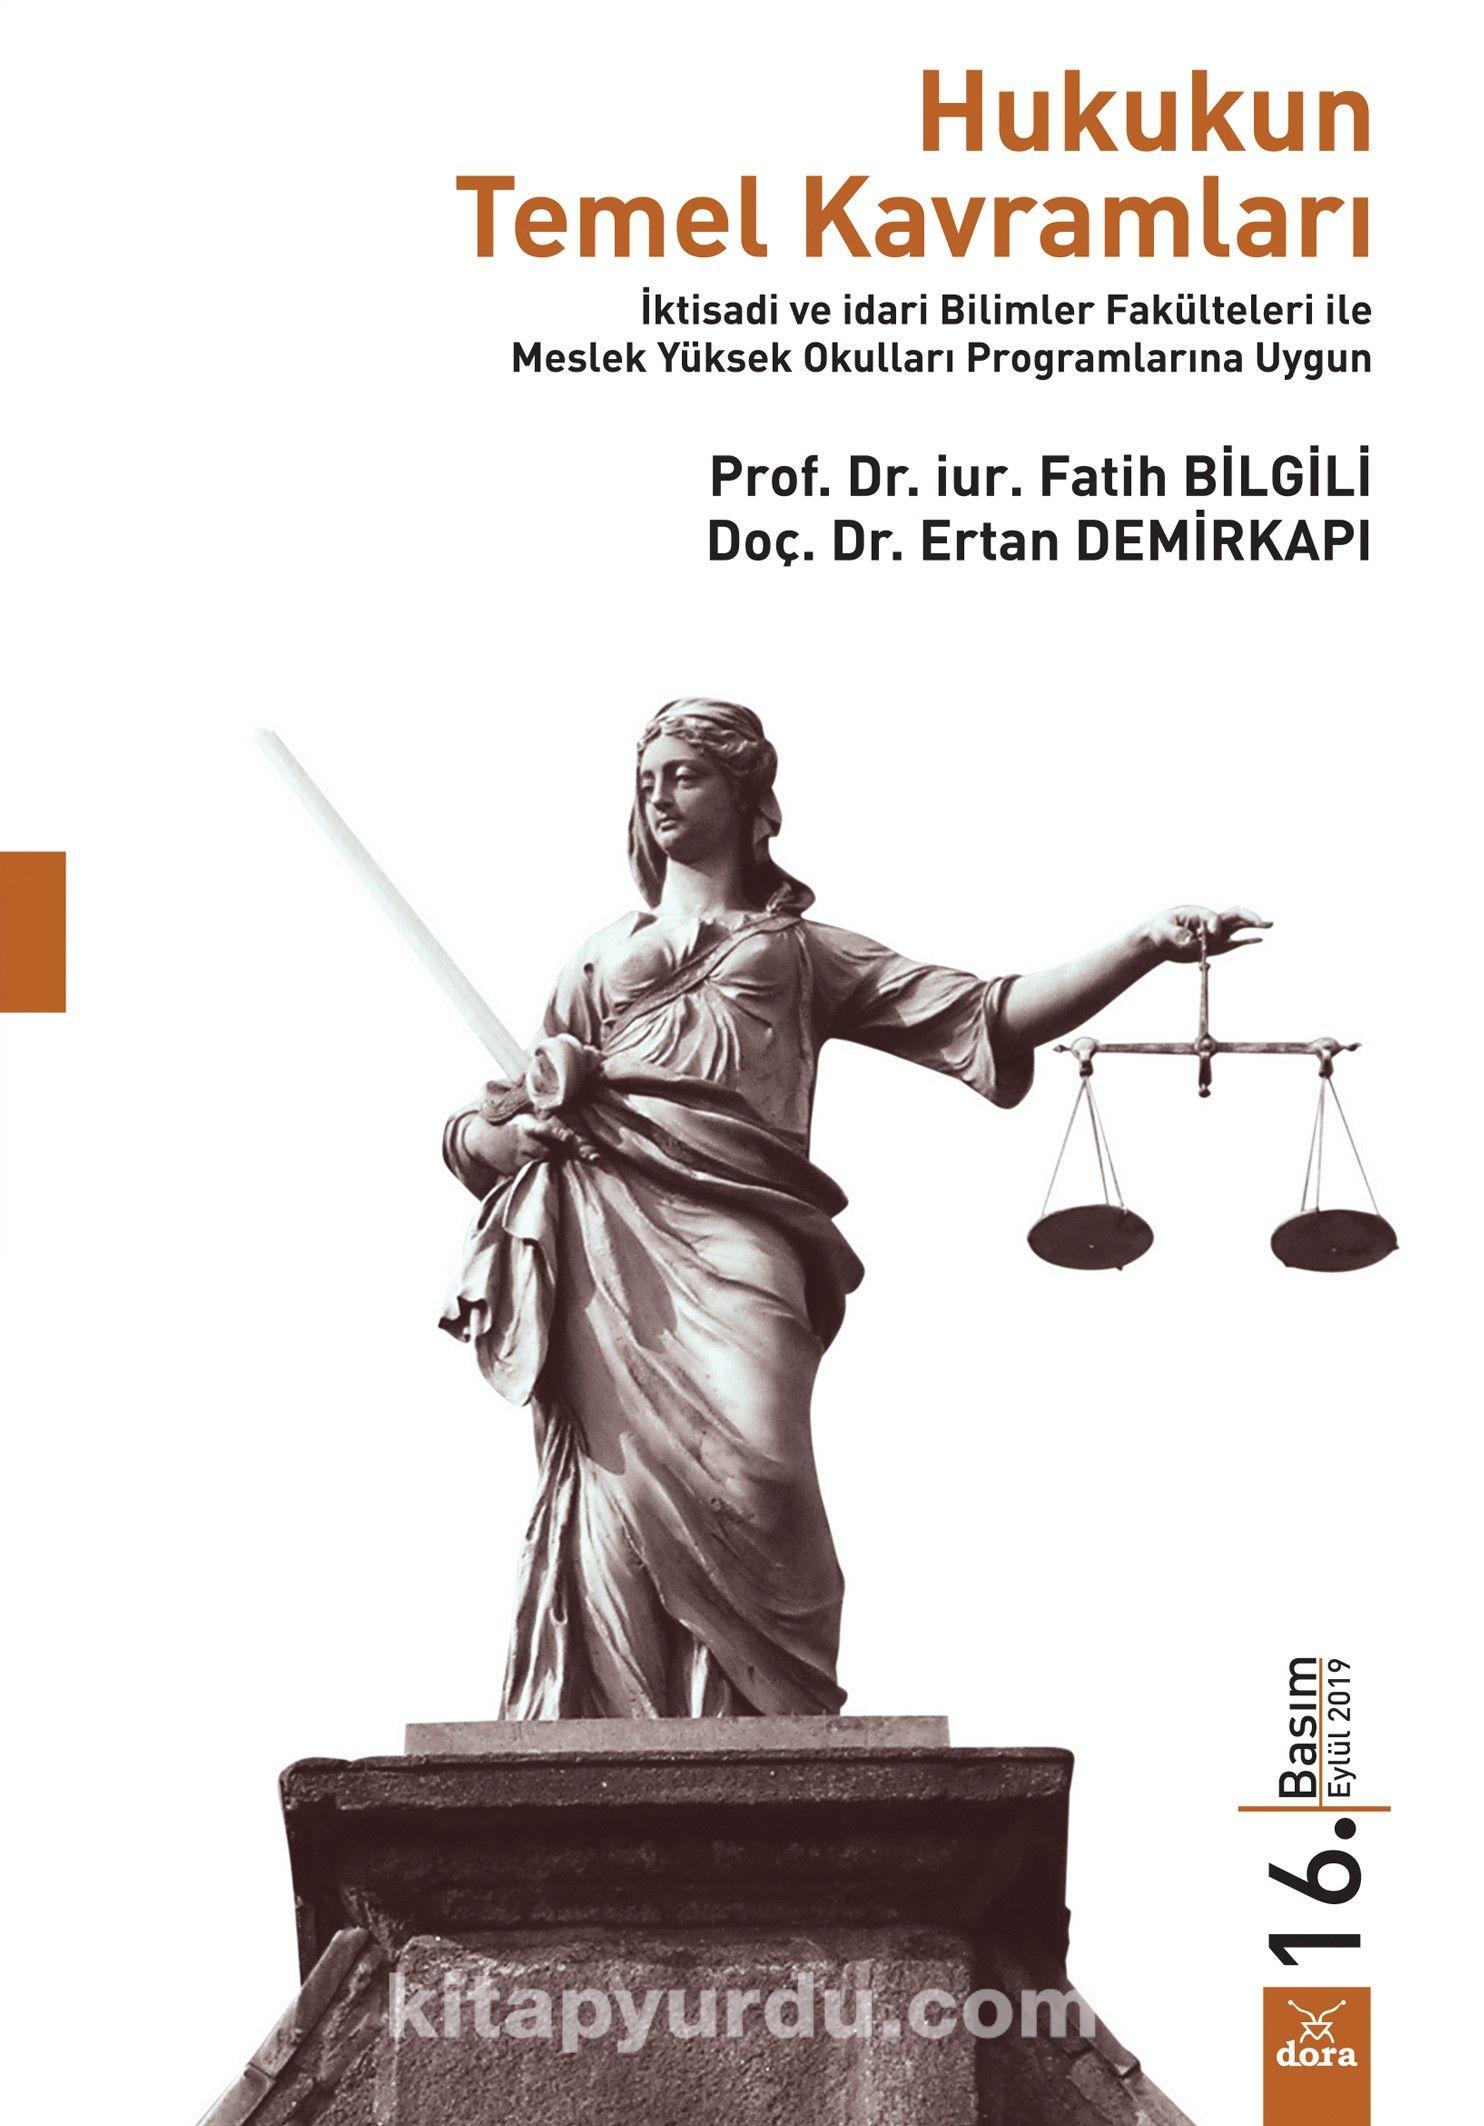 Hukukun Temel Kavramları - Prof. Dr. Fatih Bilgili pdf epub